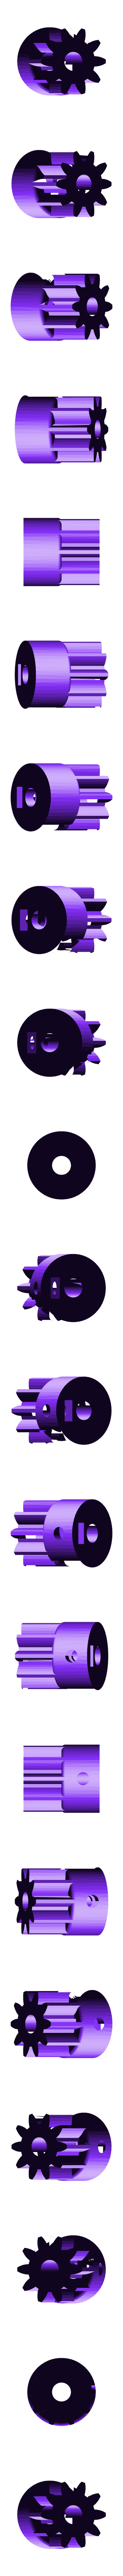 little_gear.stl Download free STL file Easy exchange filament extruder • Model to 3D print, Job